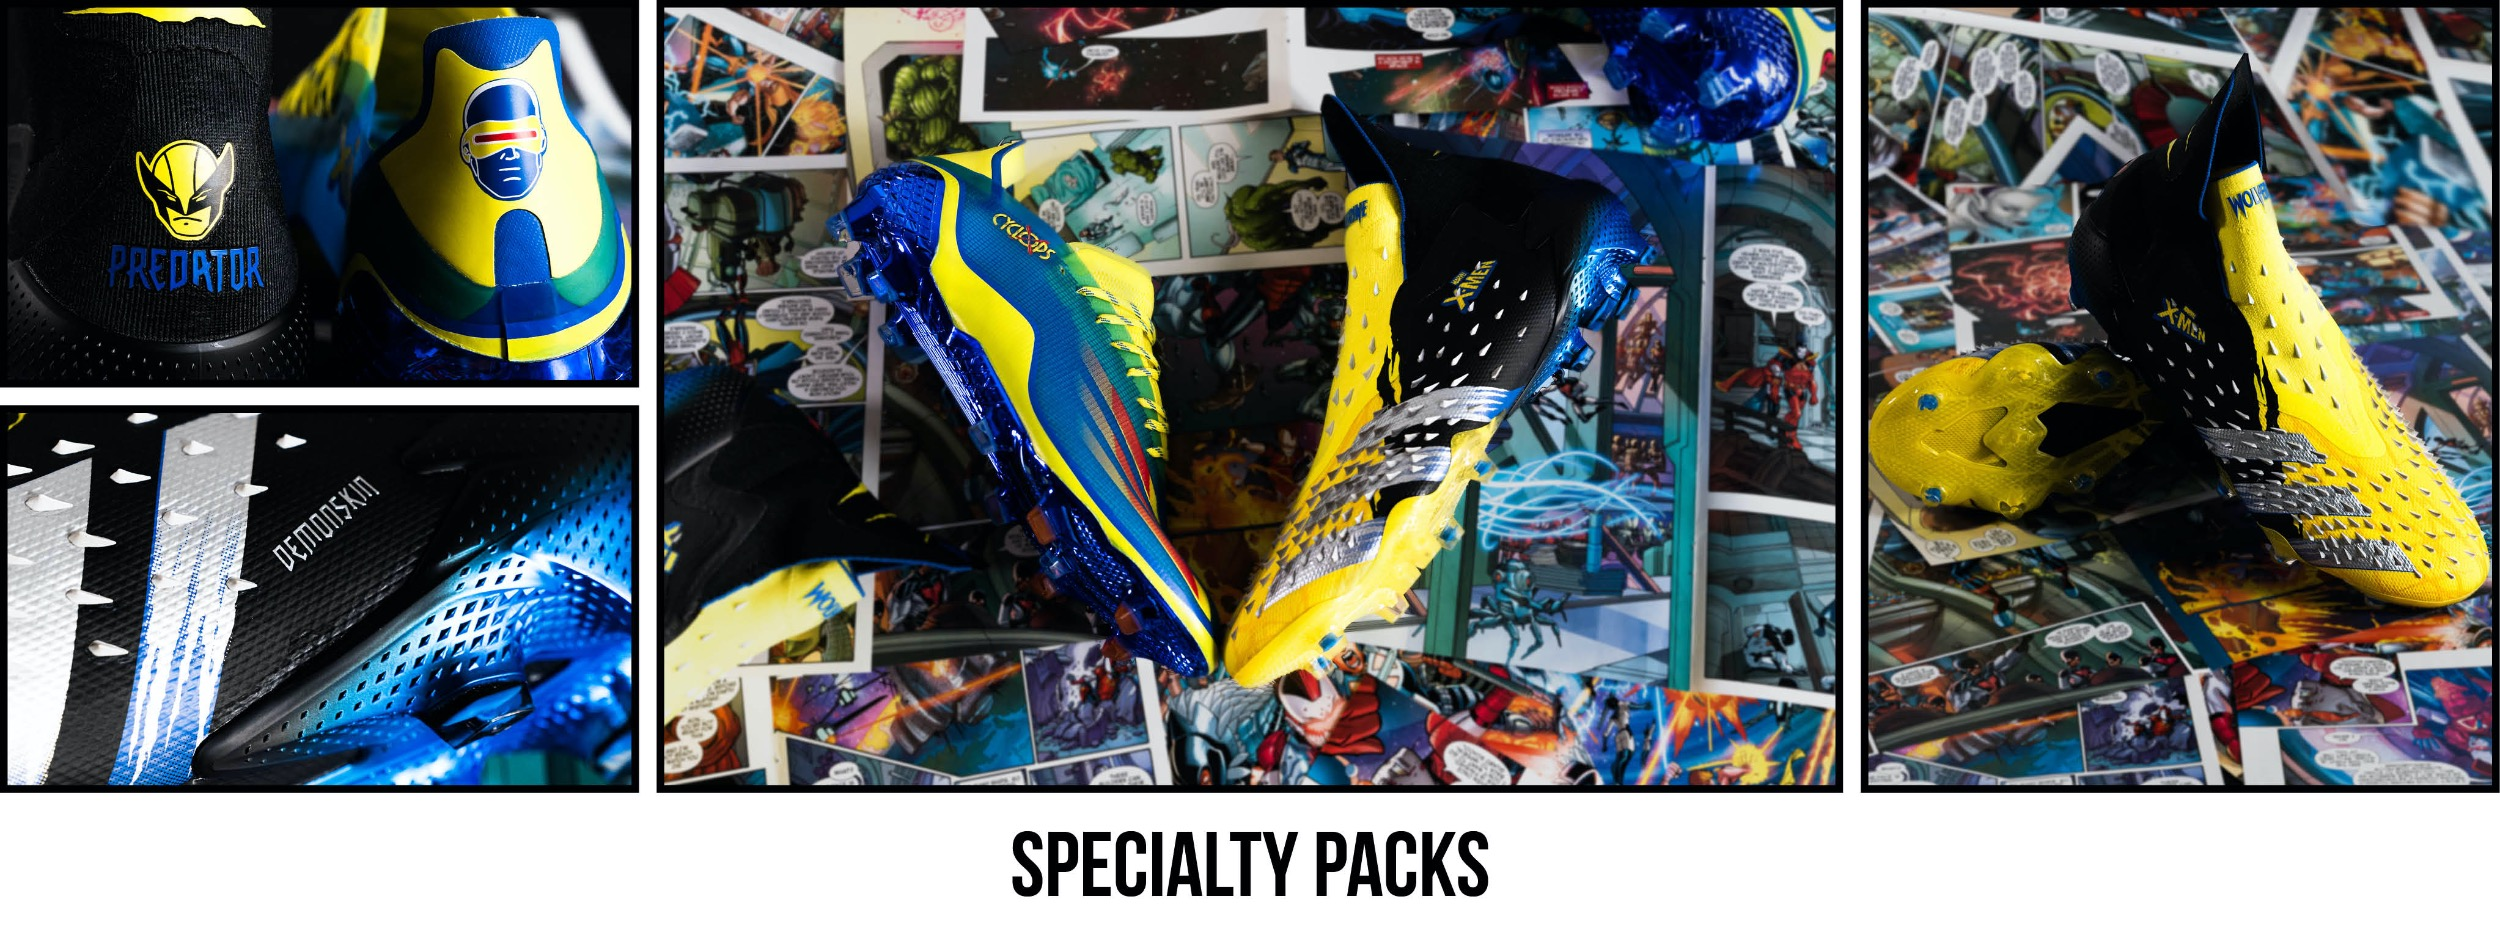 Specialty Packs